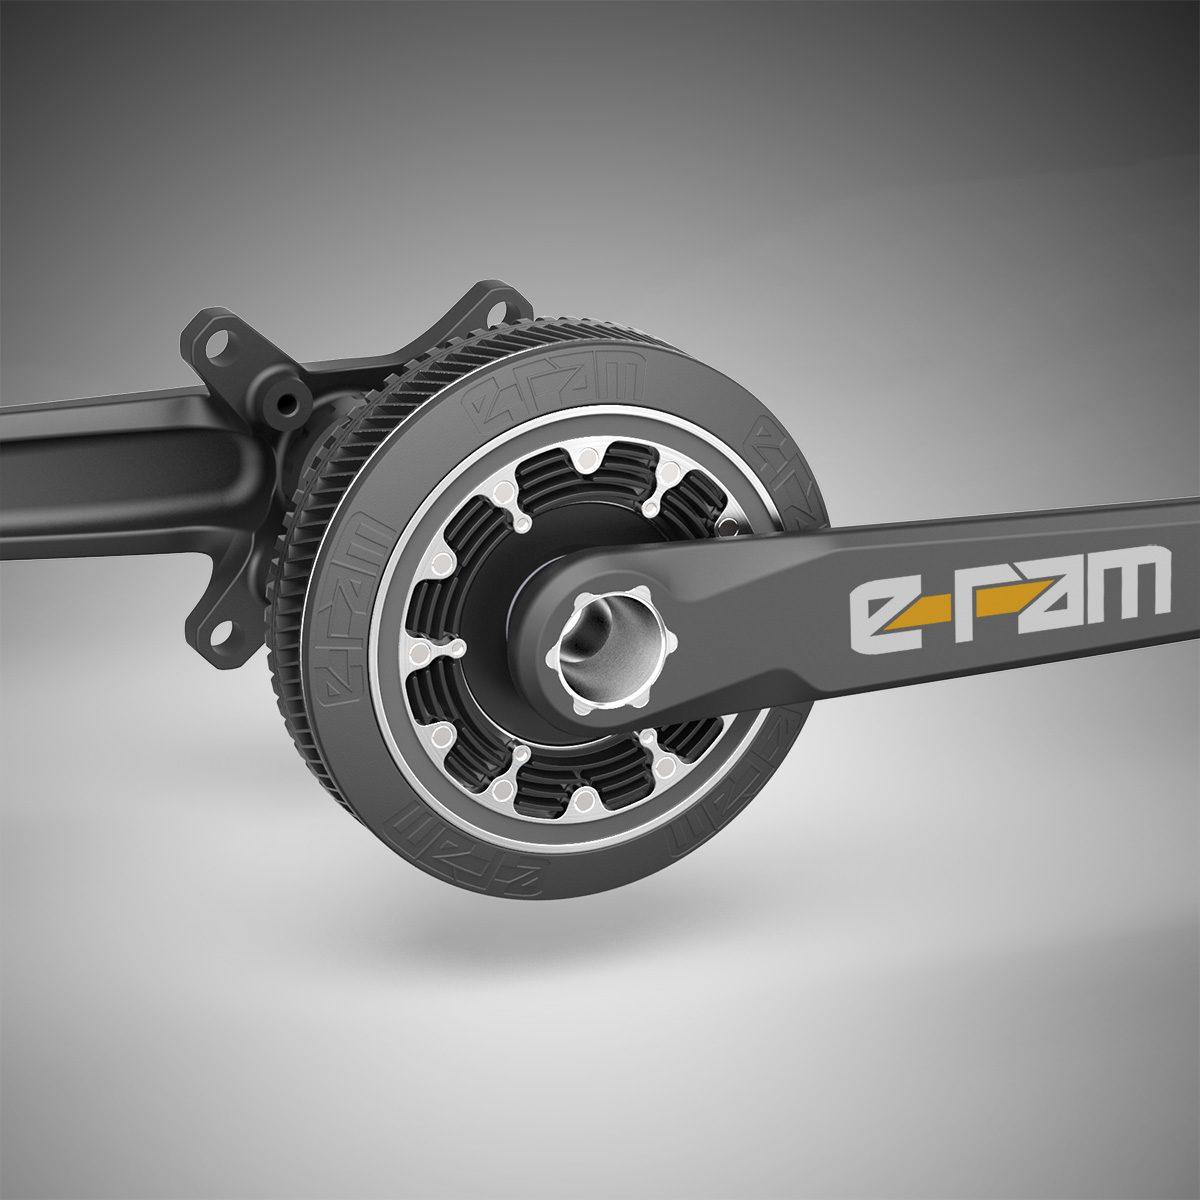 projekter_industrial_design_bionicon_eram_pedelec_ebike